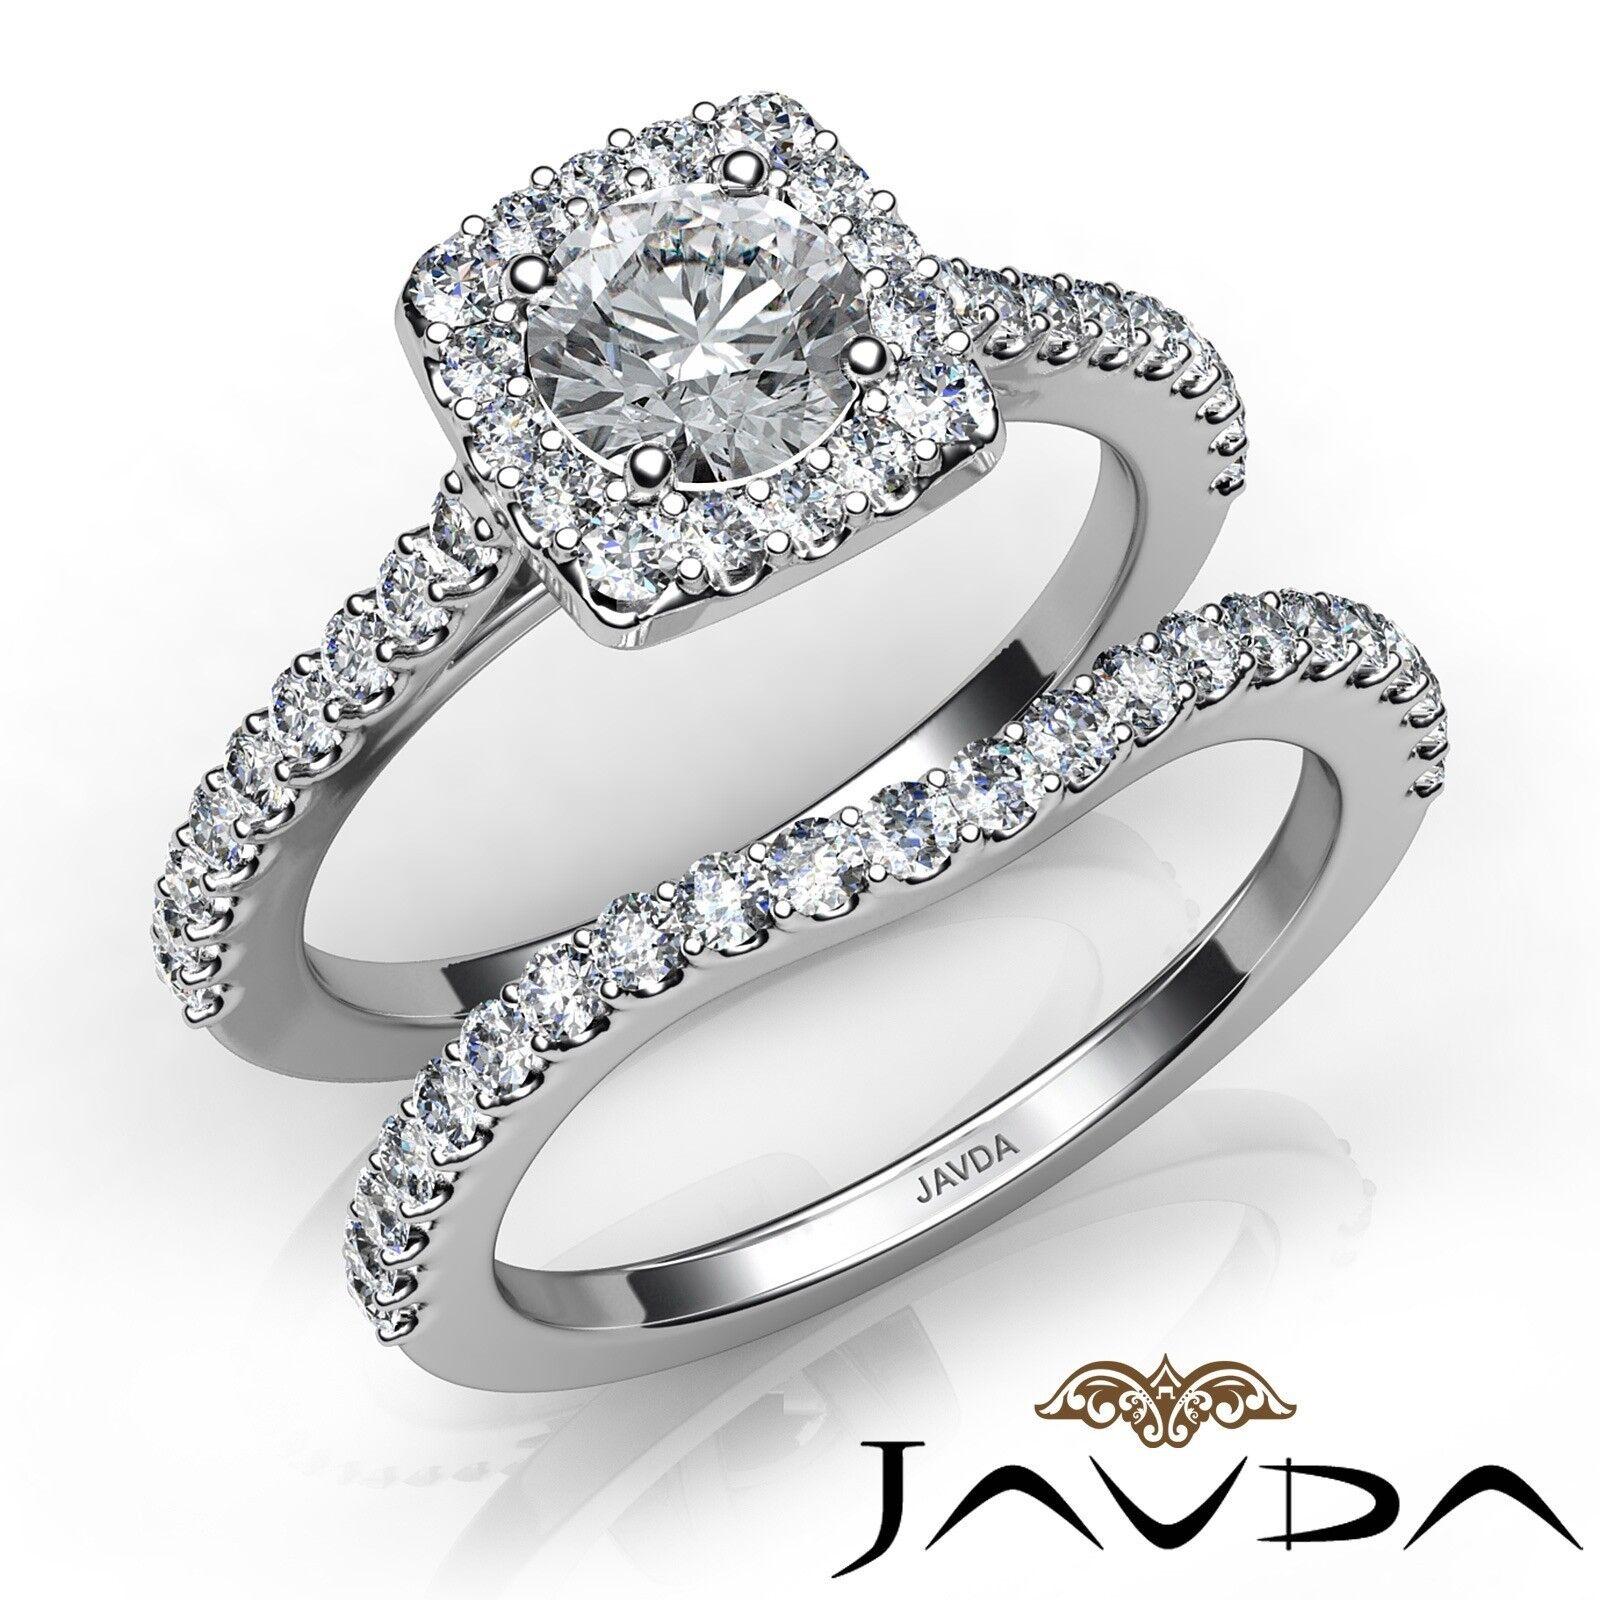 1.55ctw Halo U Prong Bridal Set Round Diamond Engagement Ring GIA H-VS1 W Gold